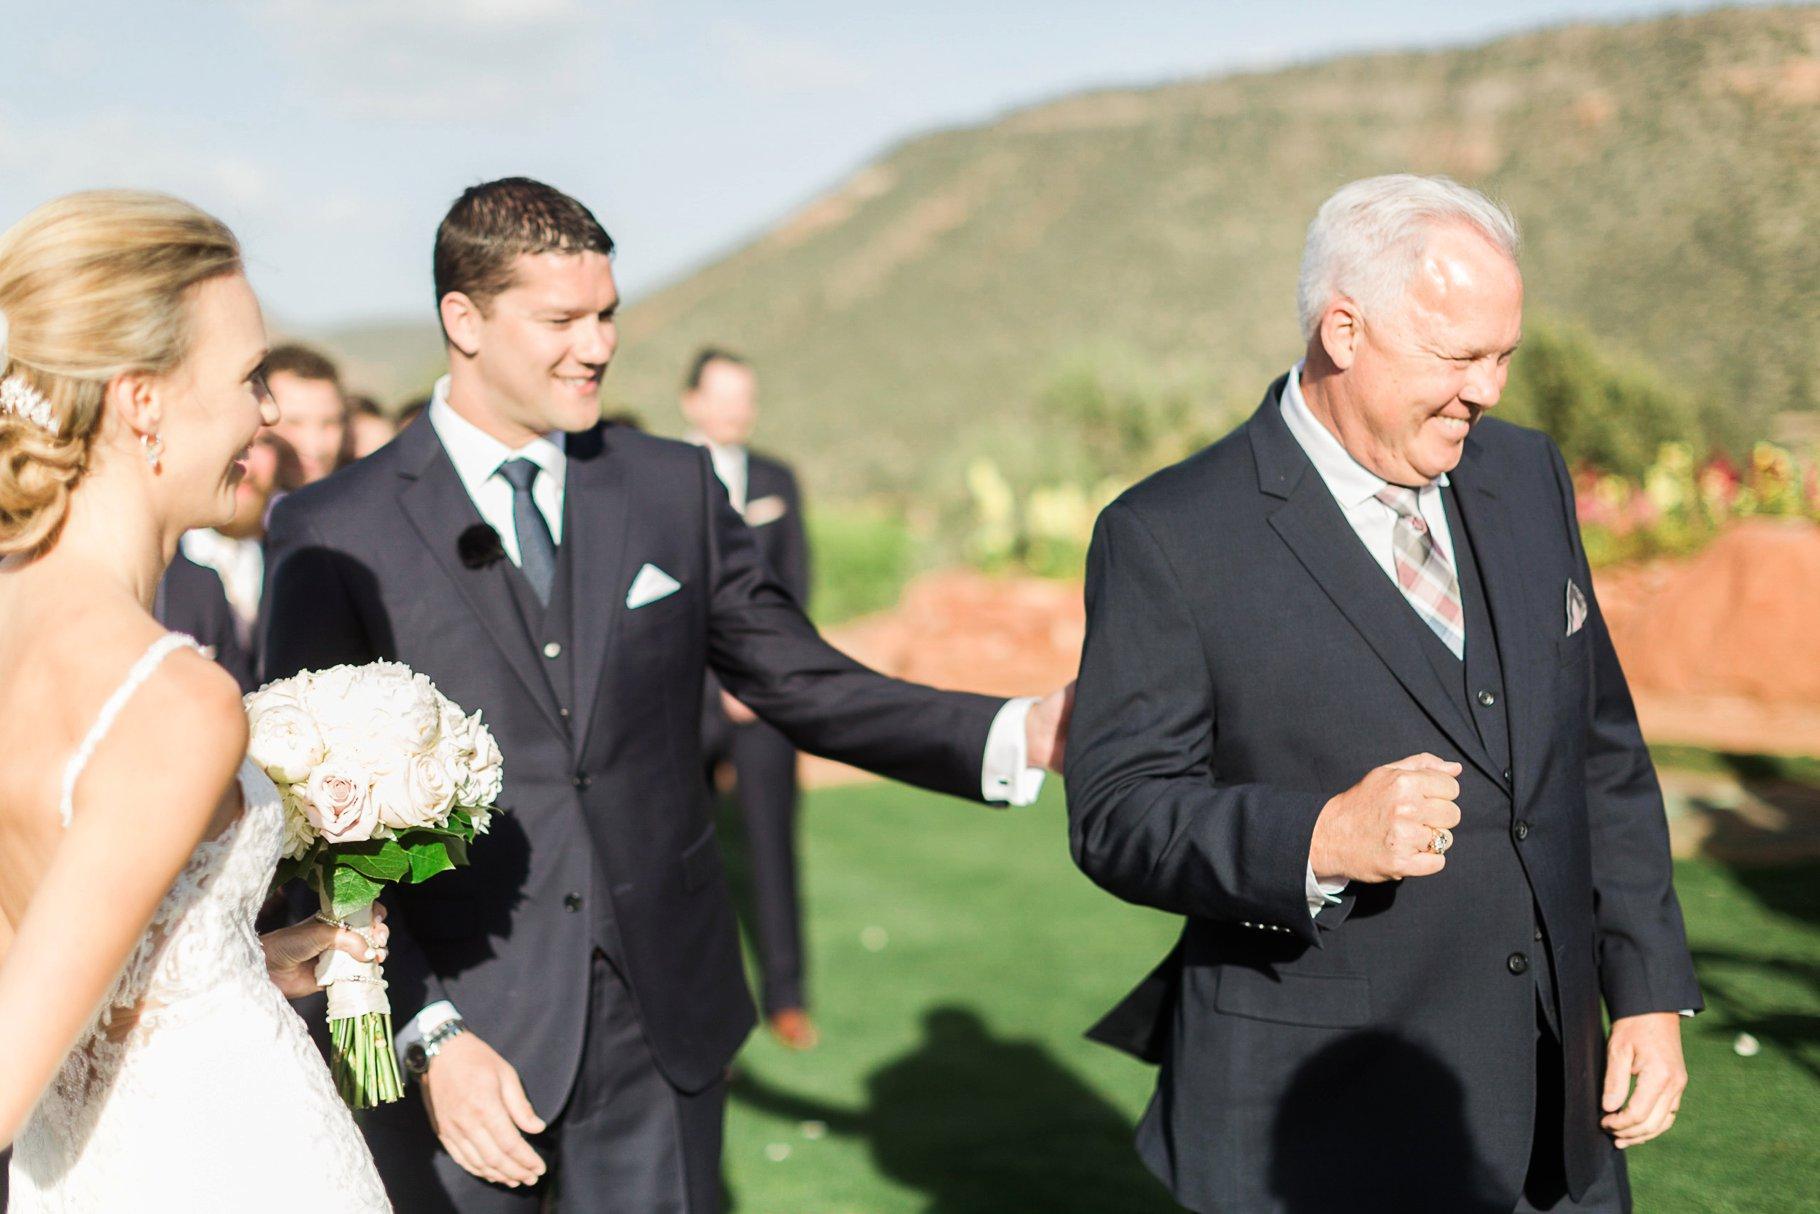 sedona wedding-72_GRETCHEN WAKEMAN PHOTOGRAPHY.jpg